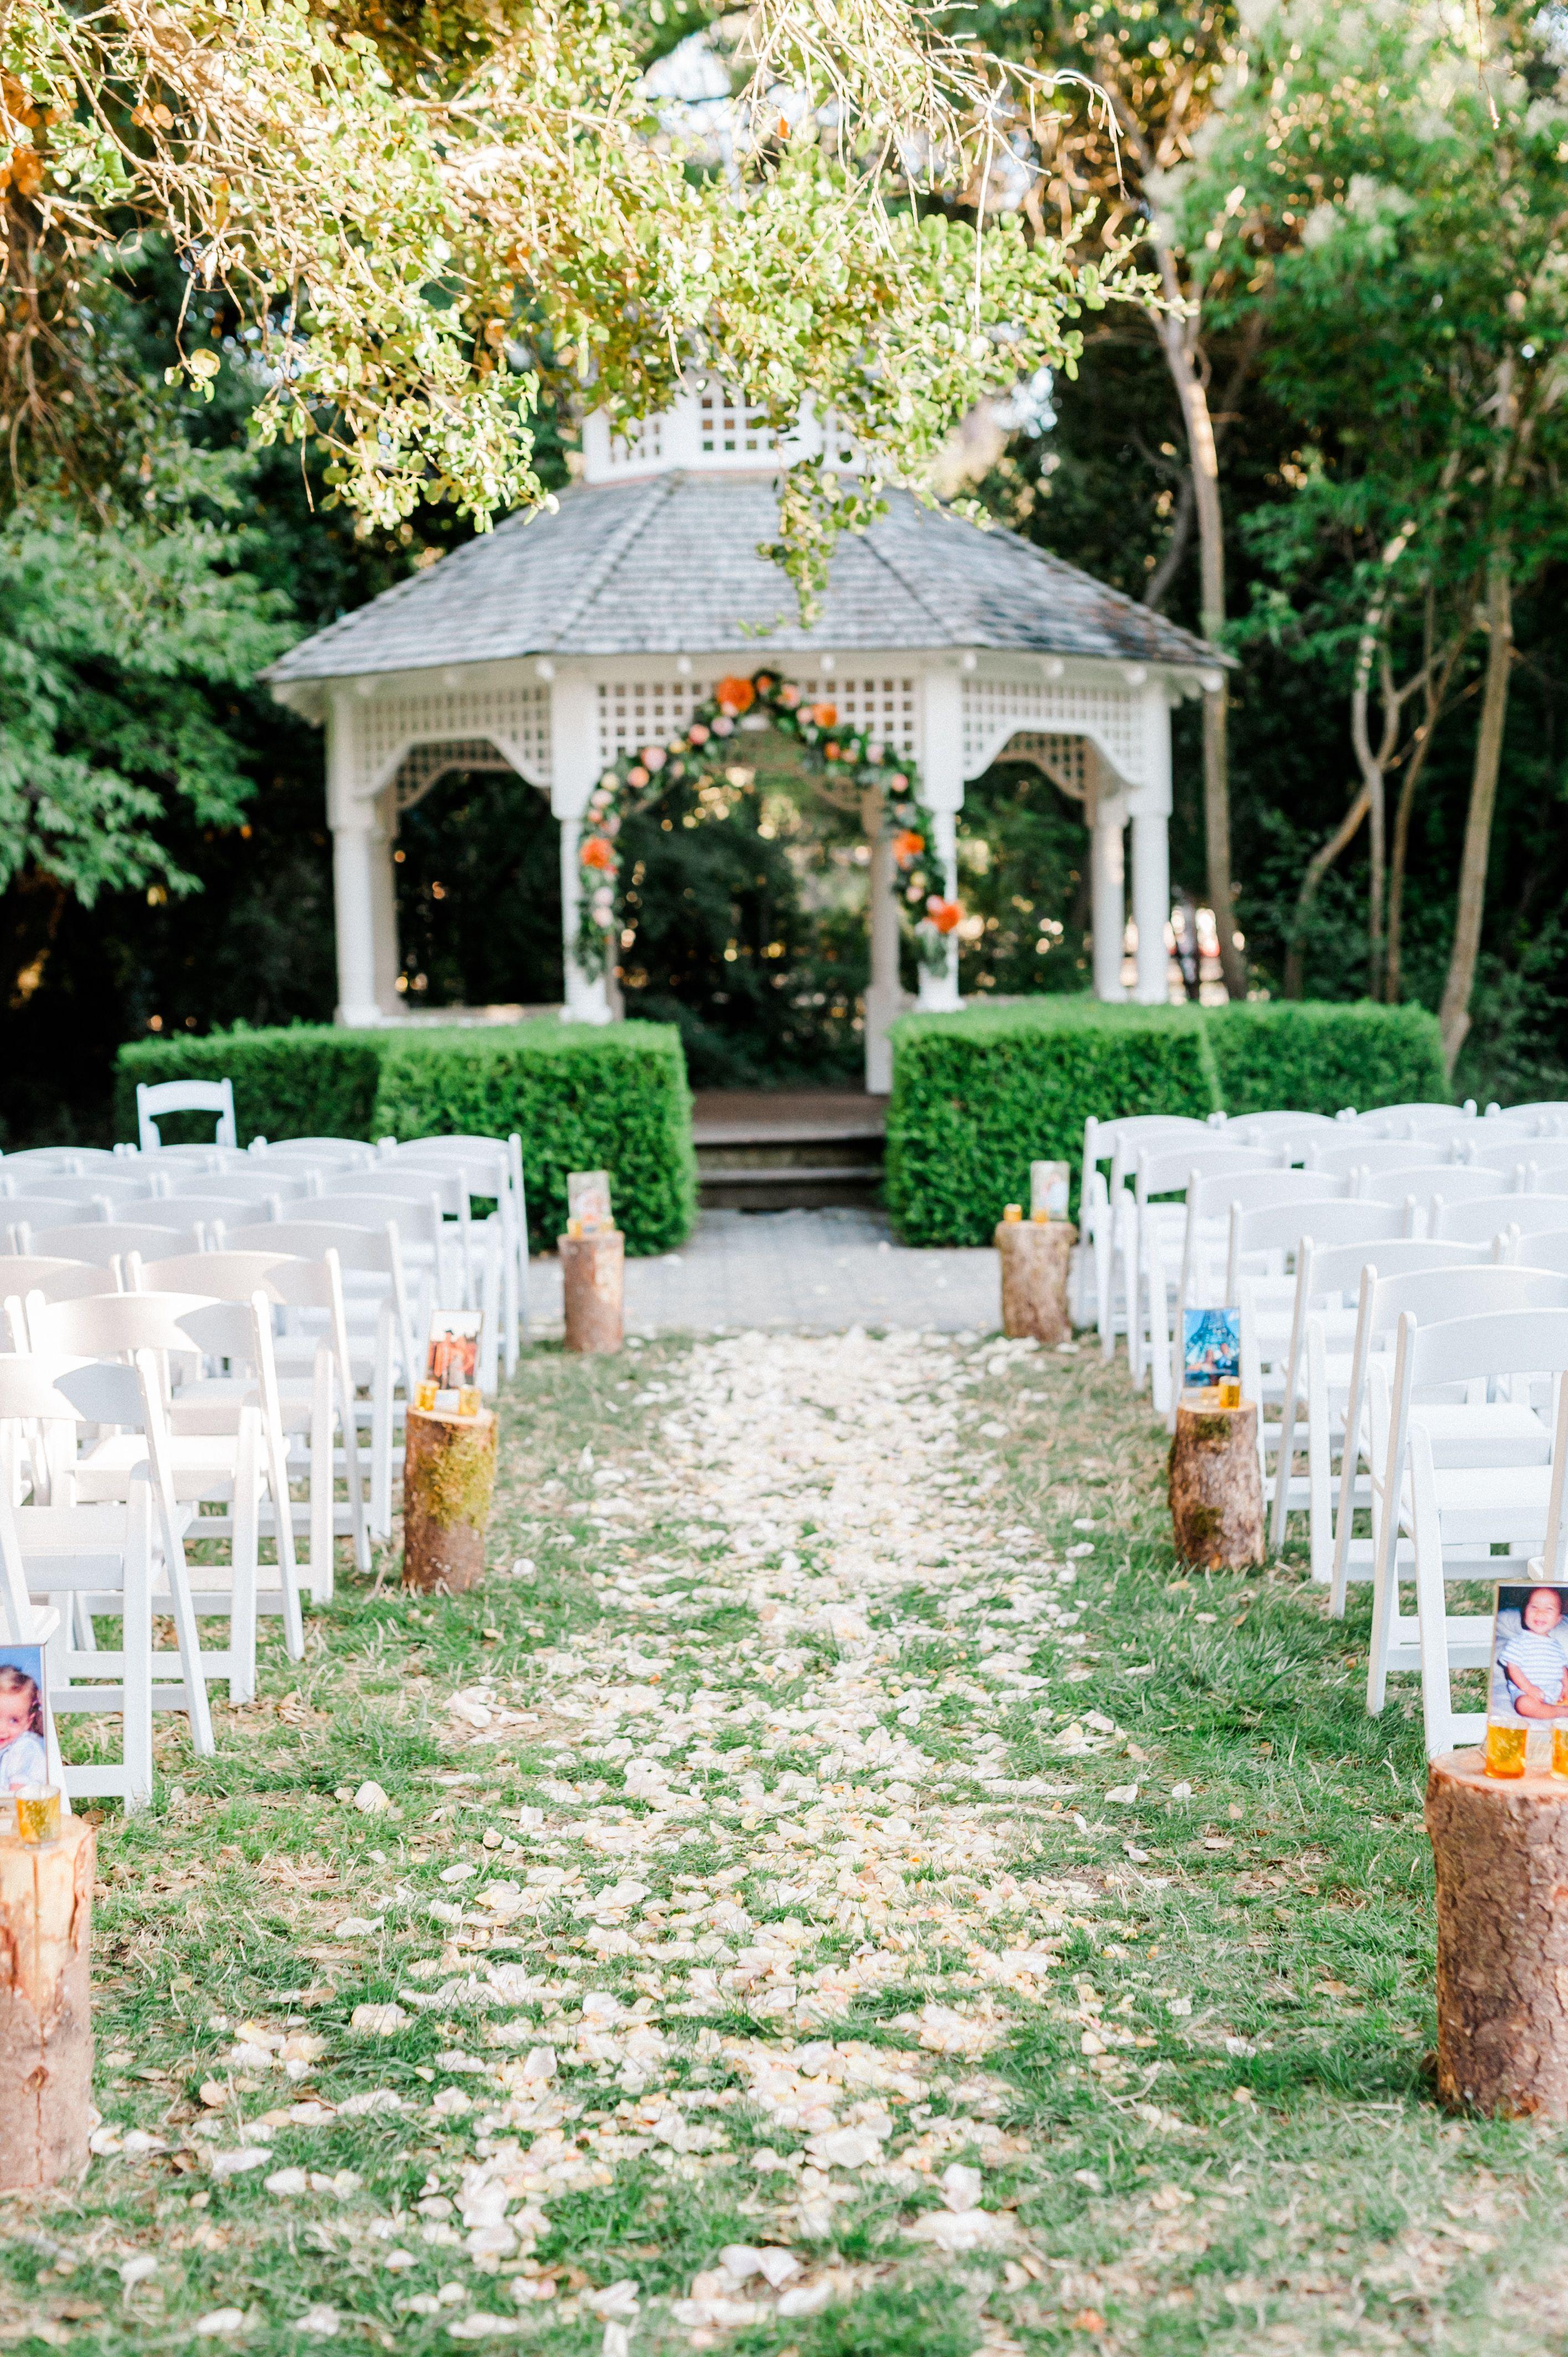 Ardenwood Historic Farms Wedding Fremont Ca Bay Area Wedding Photographer In 2020 Wedding Venues California Bay Area Bay Area Wedding Venues Garden Wedding Venue